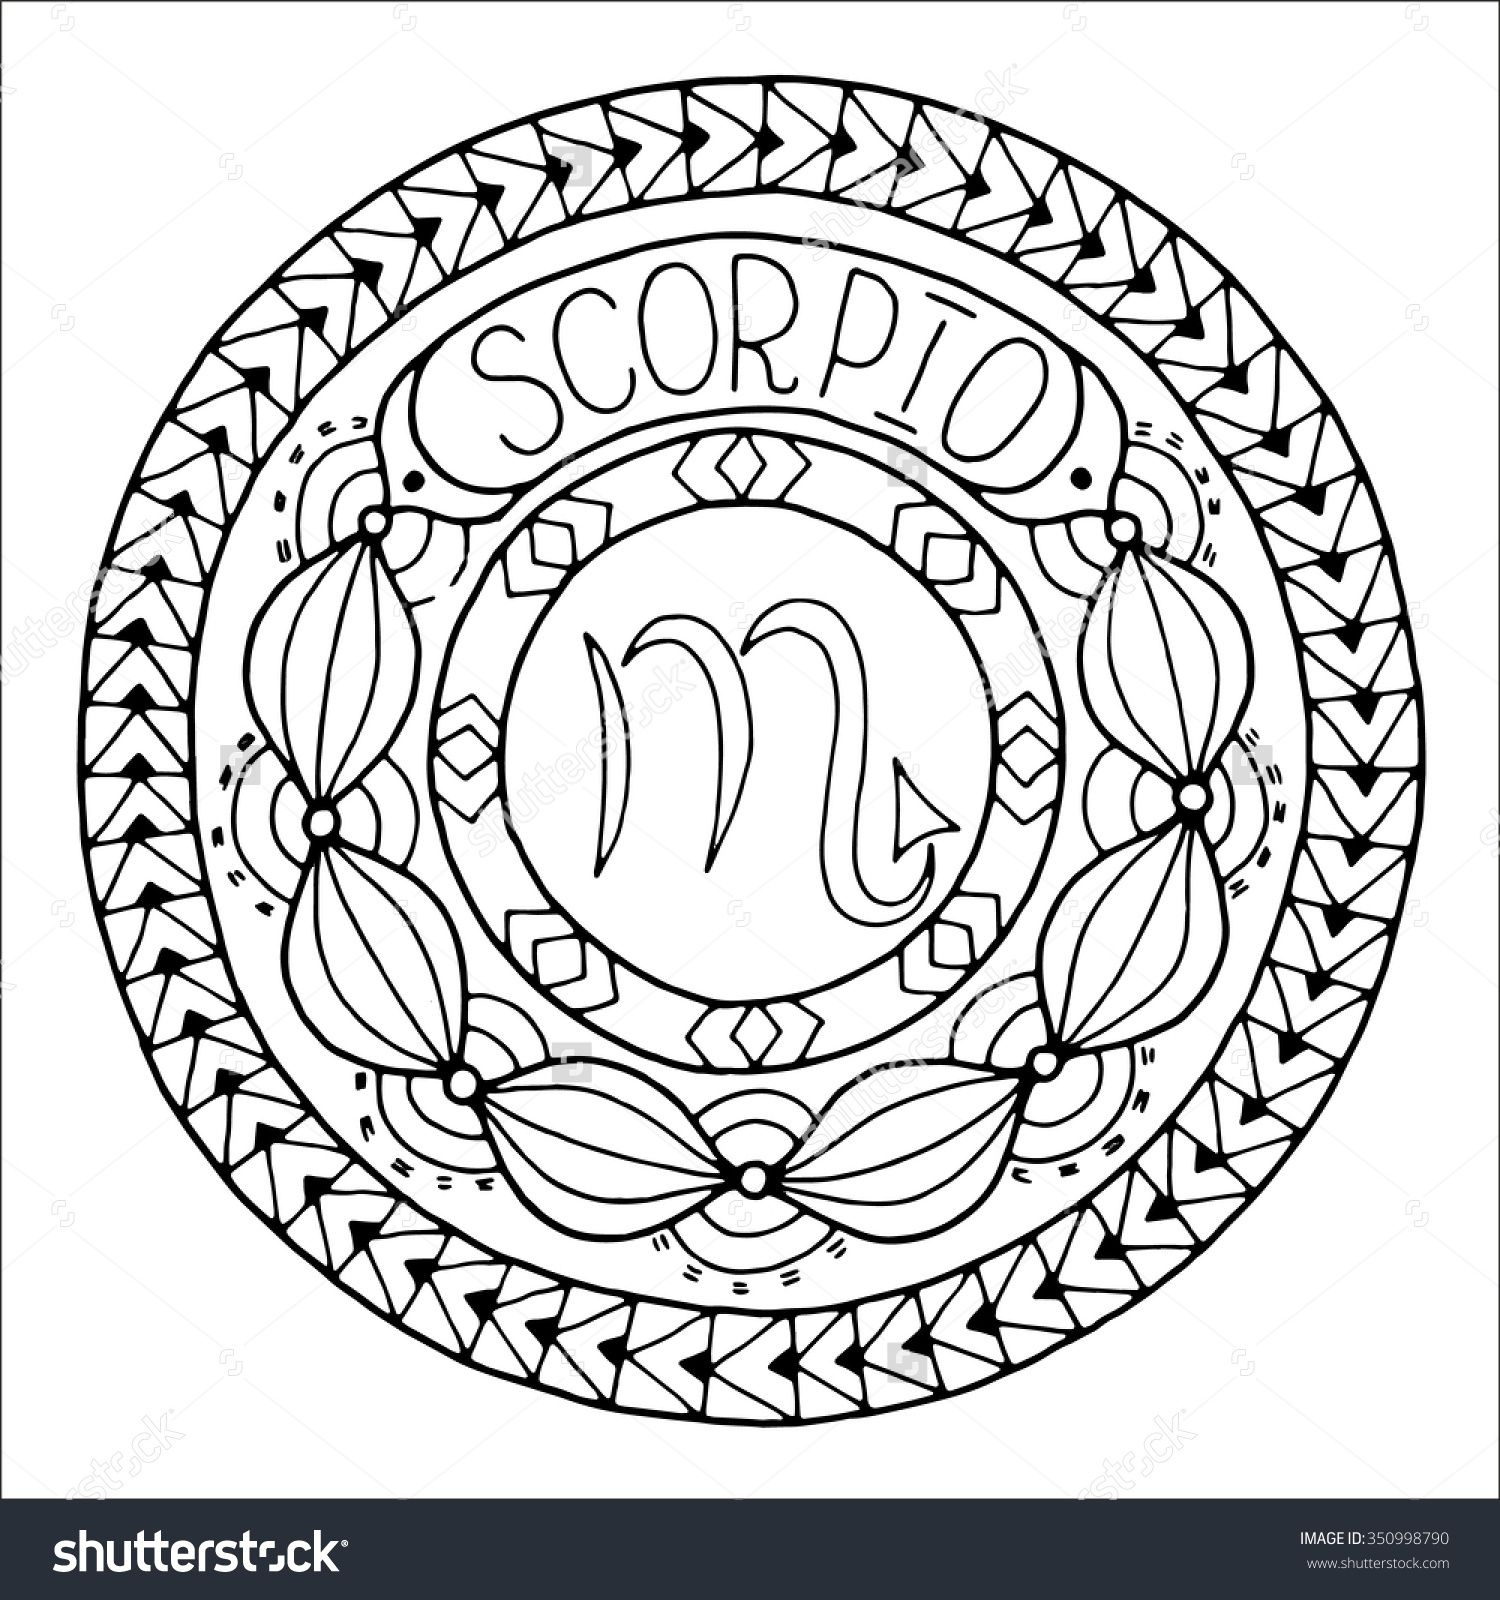 Zodiac Sign Of Scorpio  Shutterstock   Zodiac